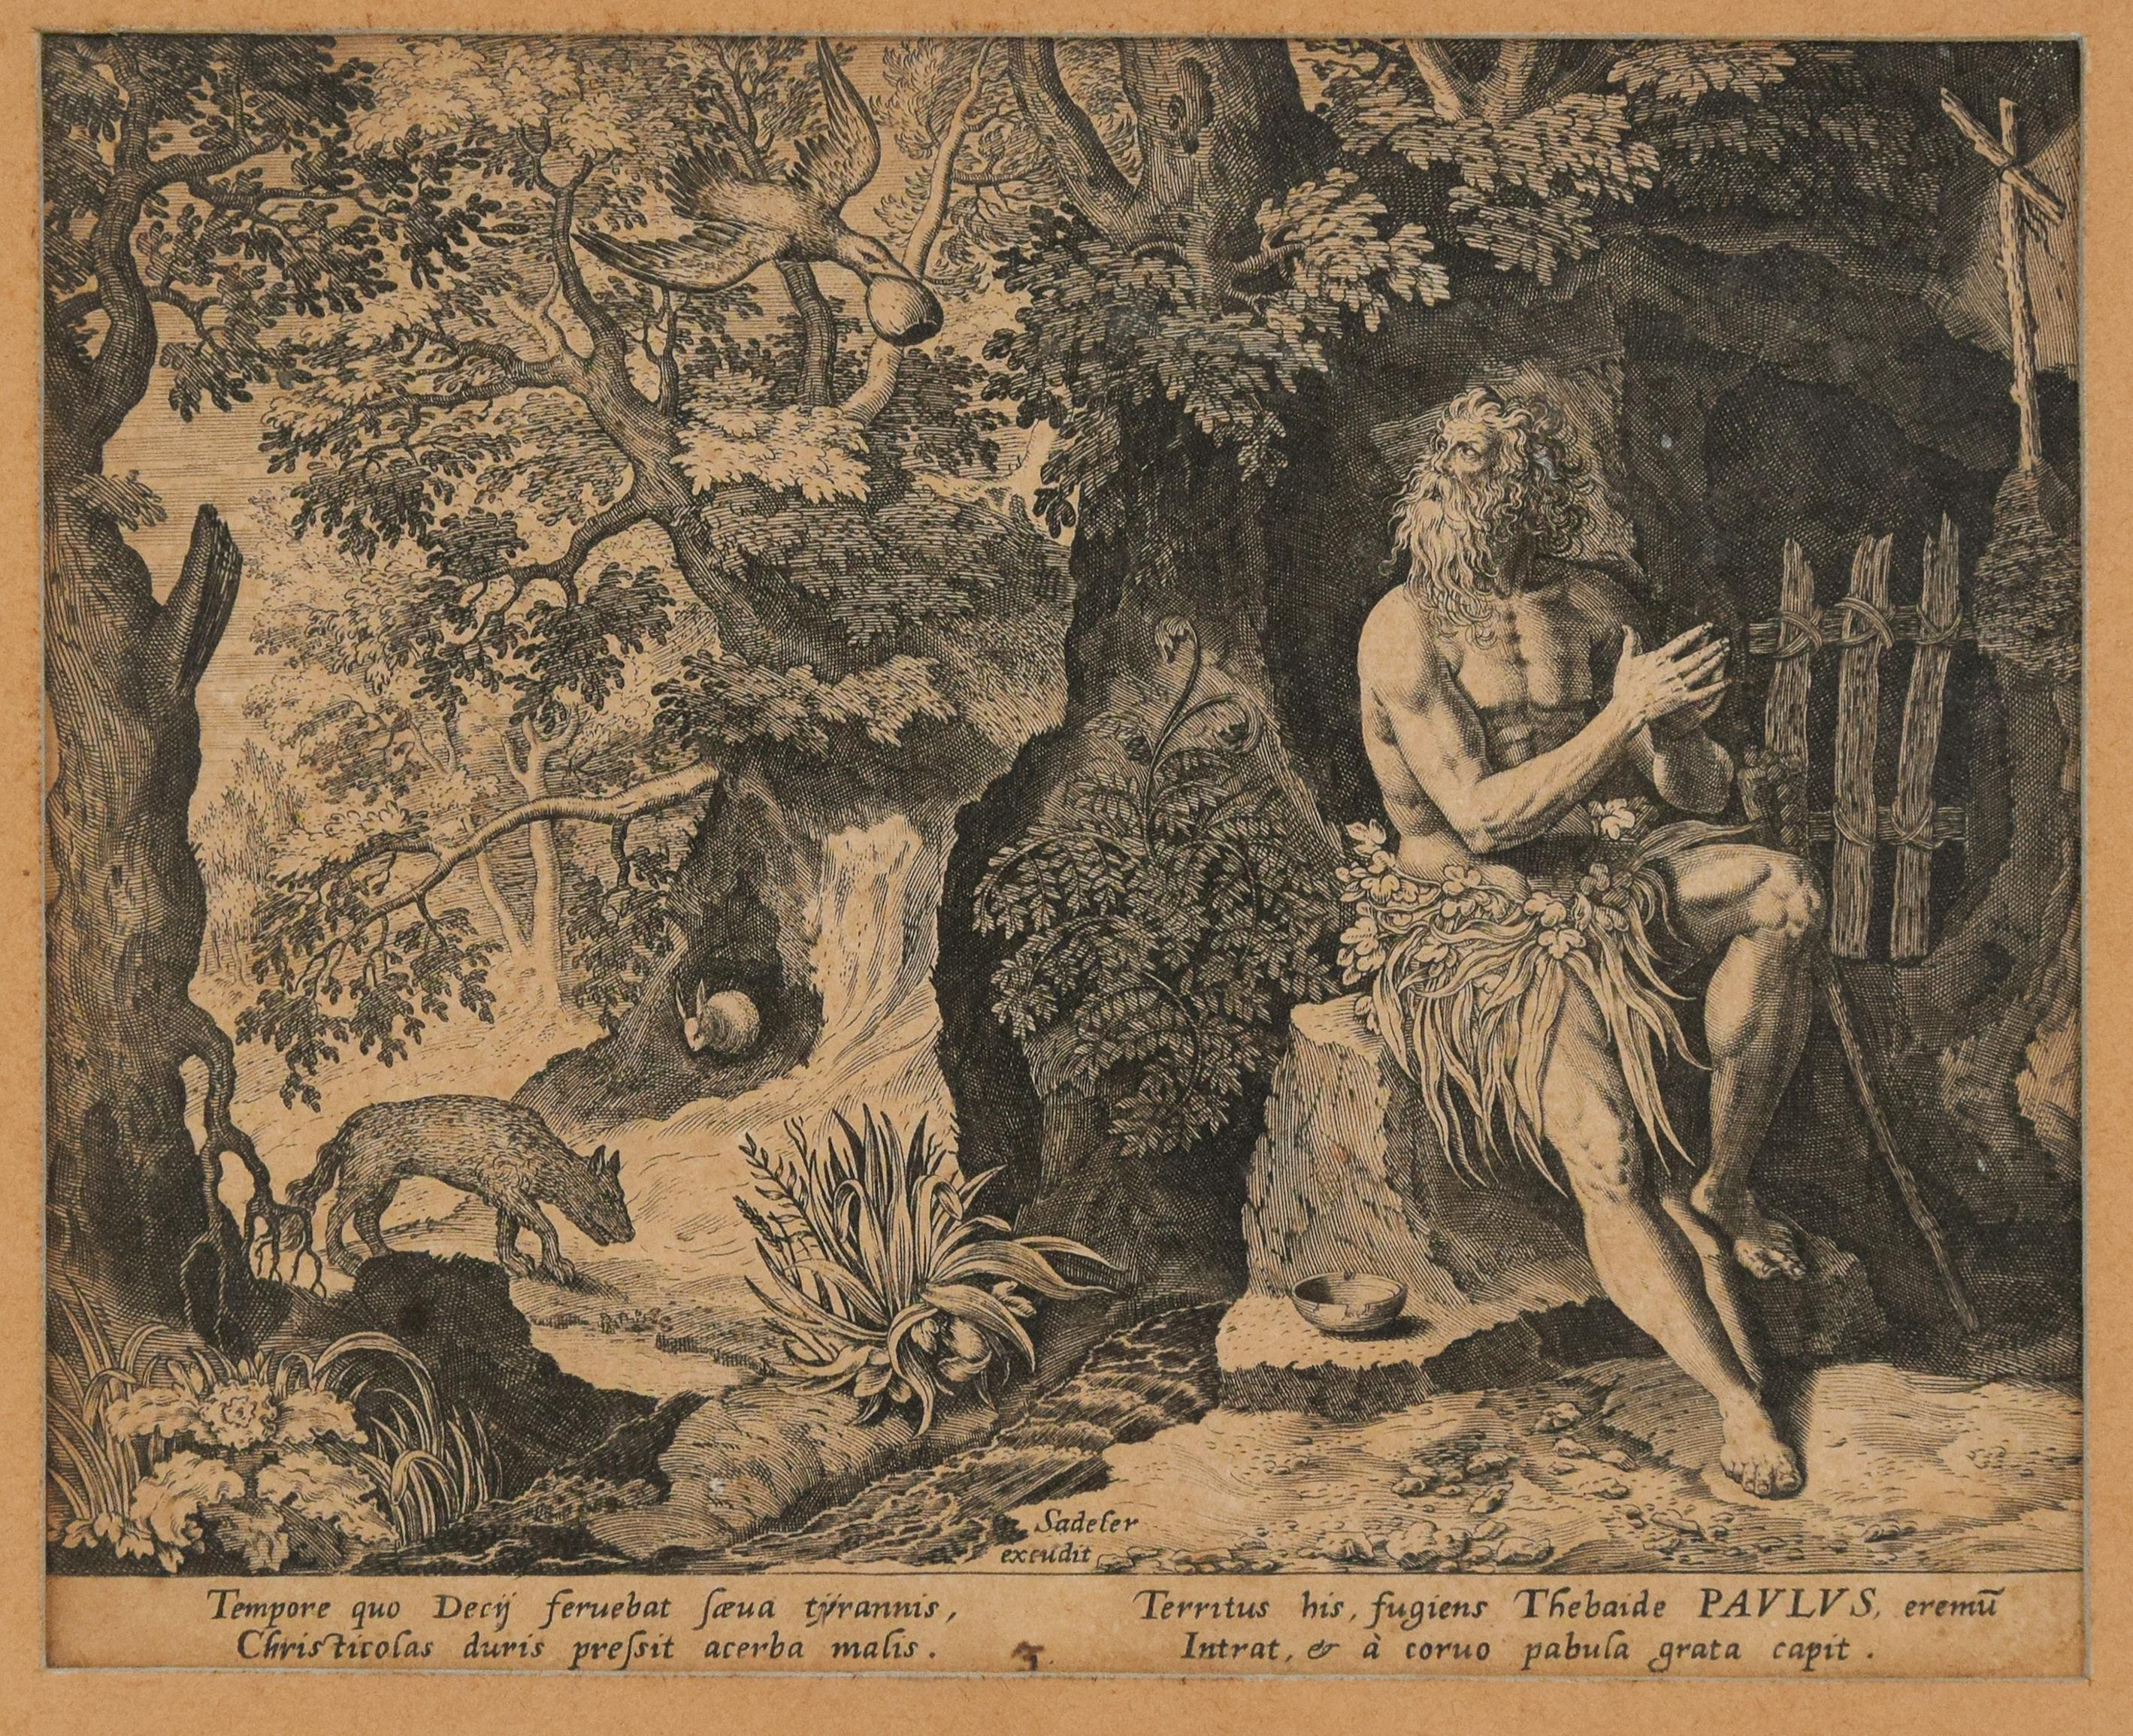 Paulus the Hermit - Original Etching by Johannes Sadeler